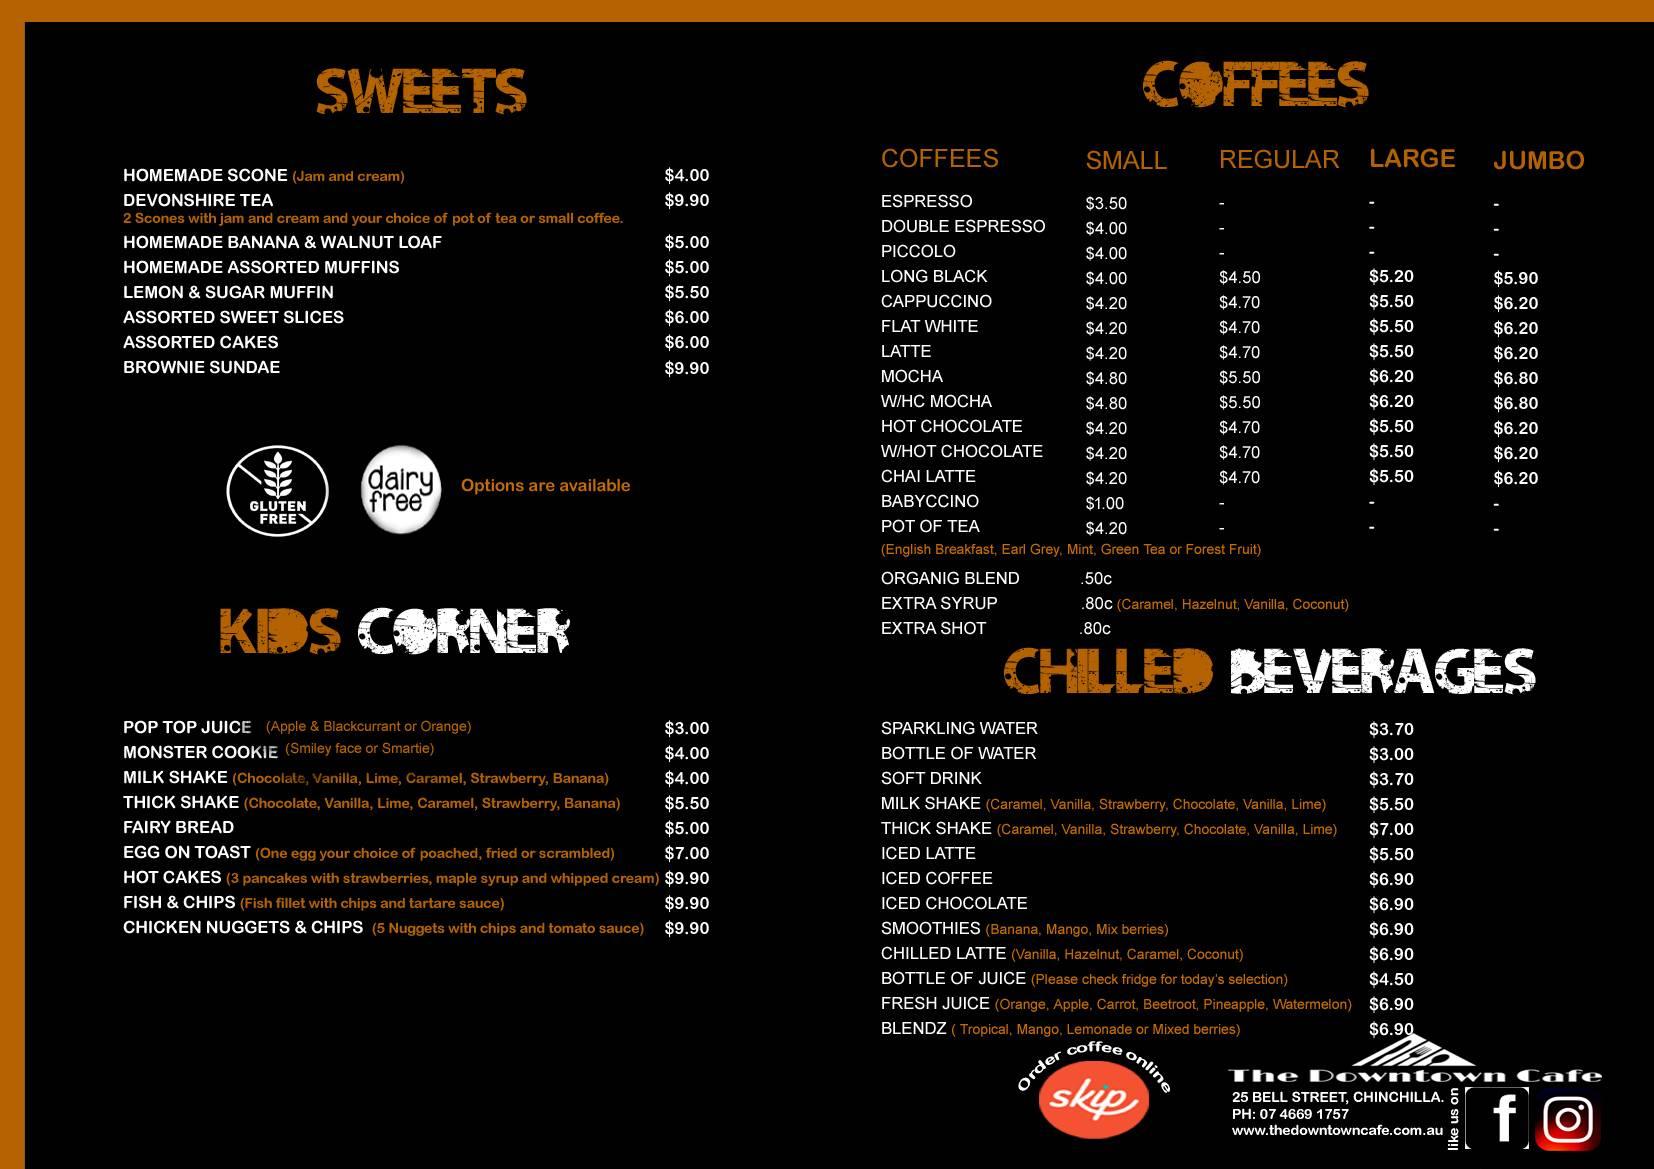 Hot & Chilled Beverages